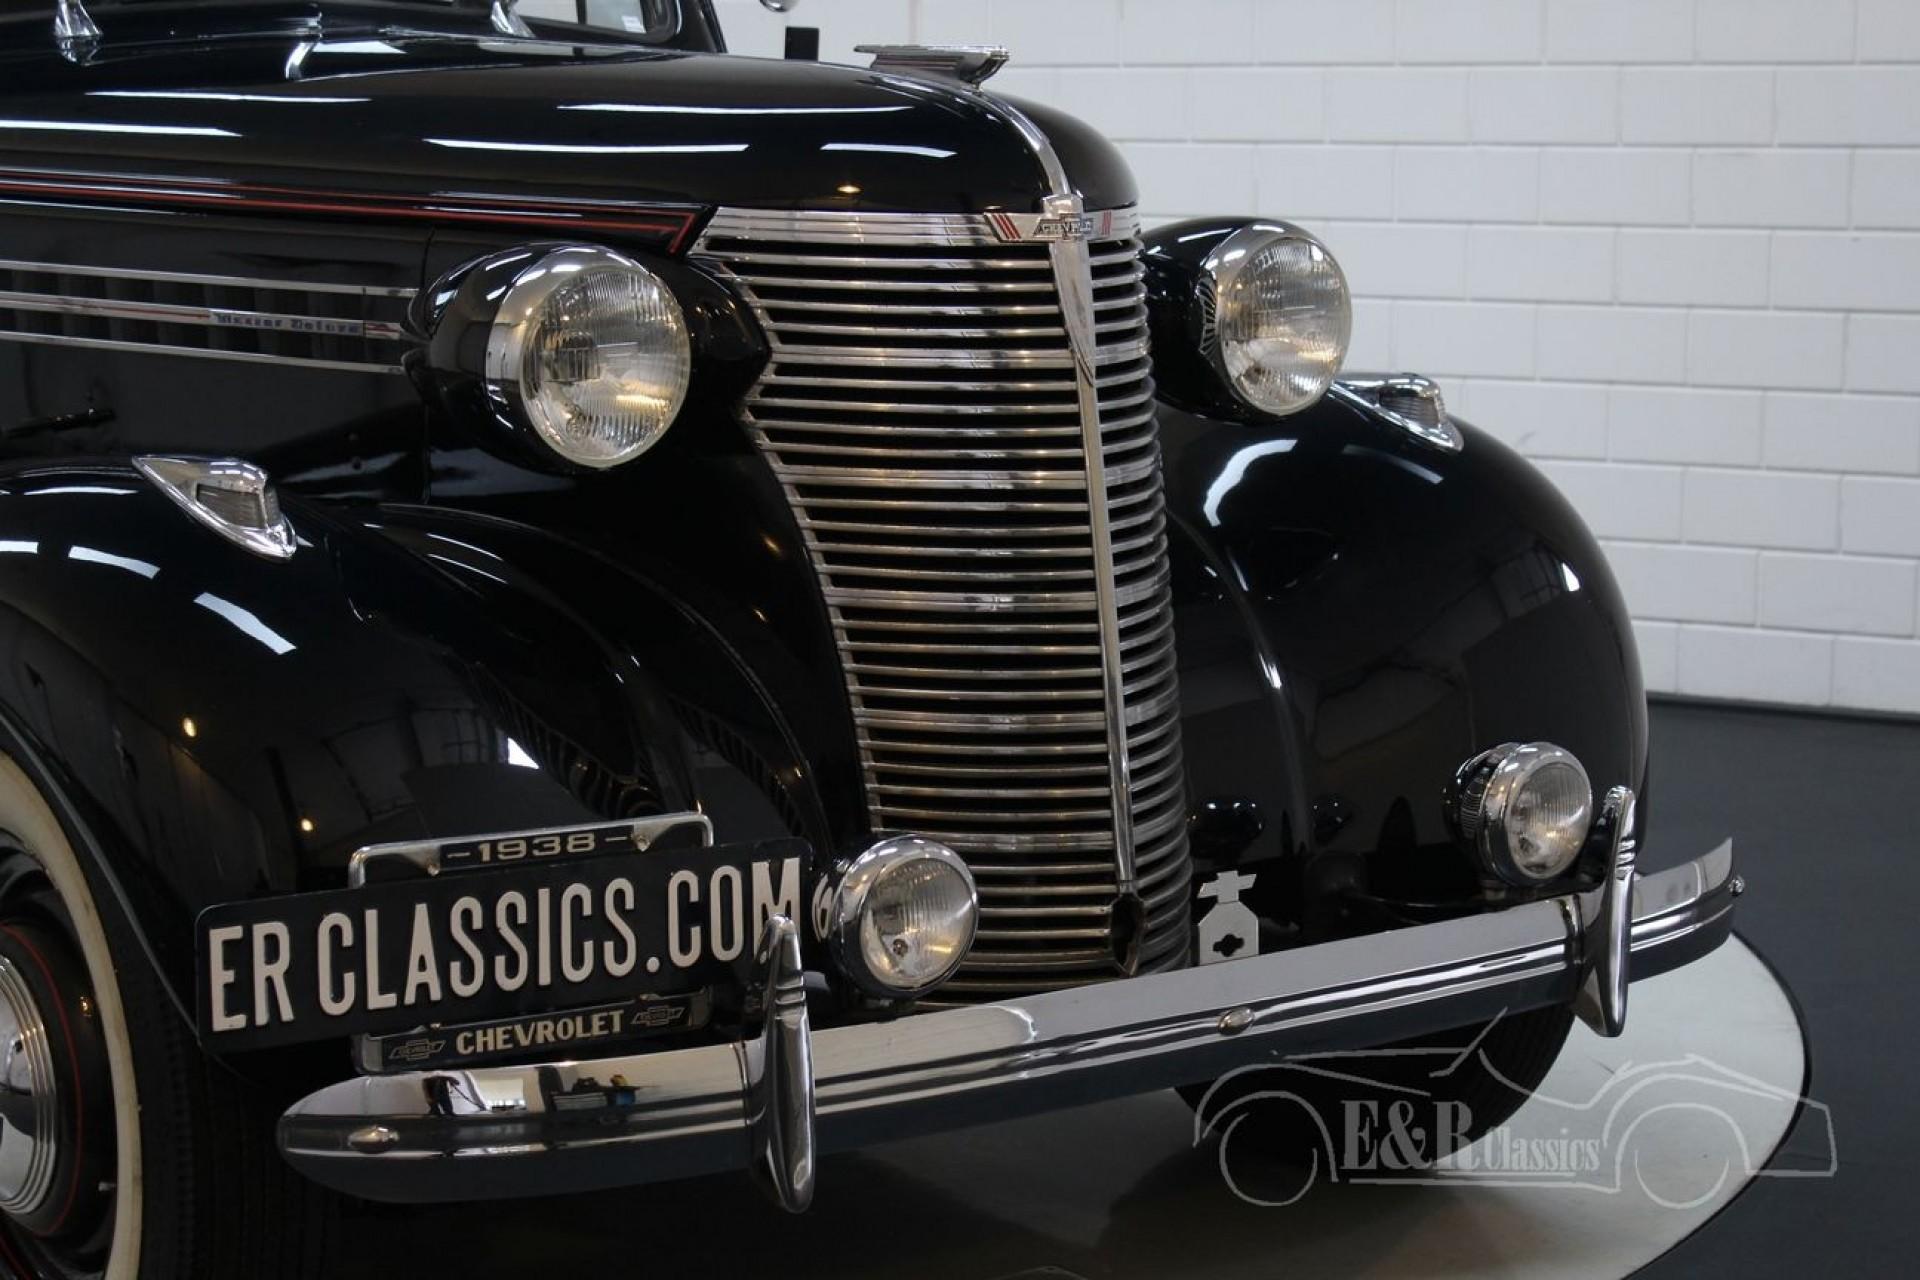 Kelebihan Chevrolet 1938 Review